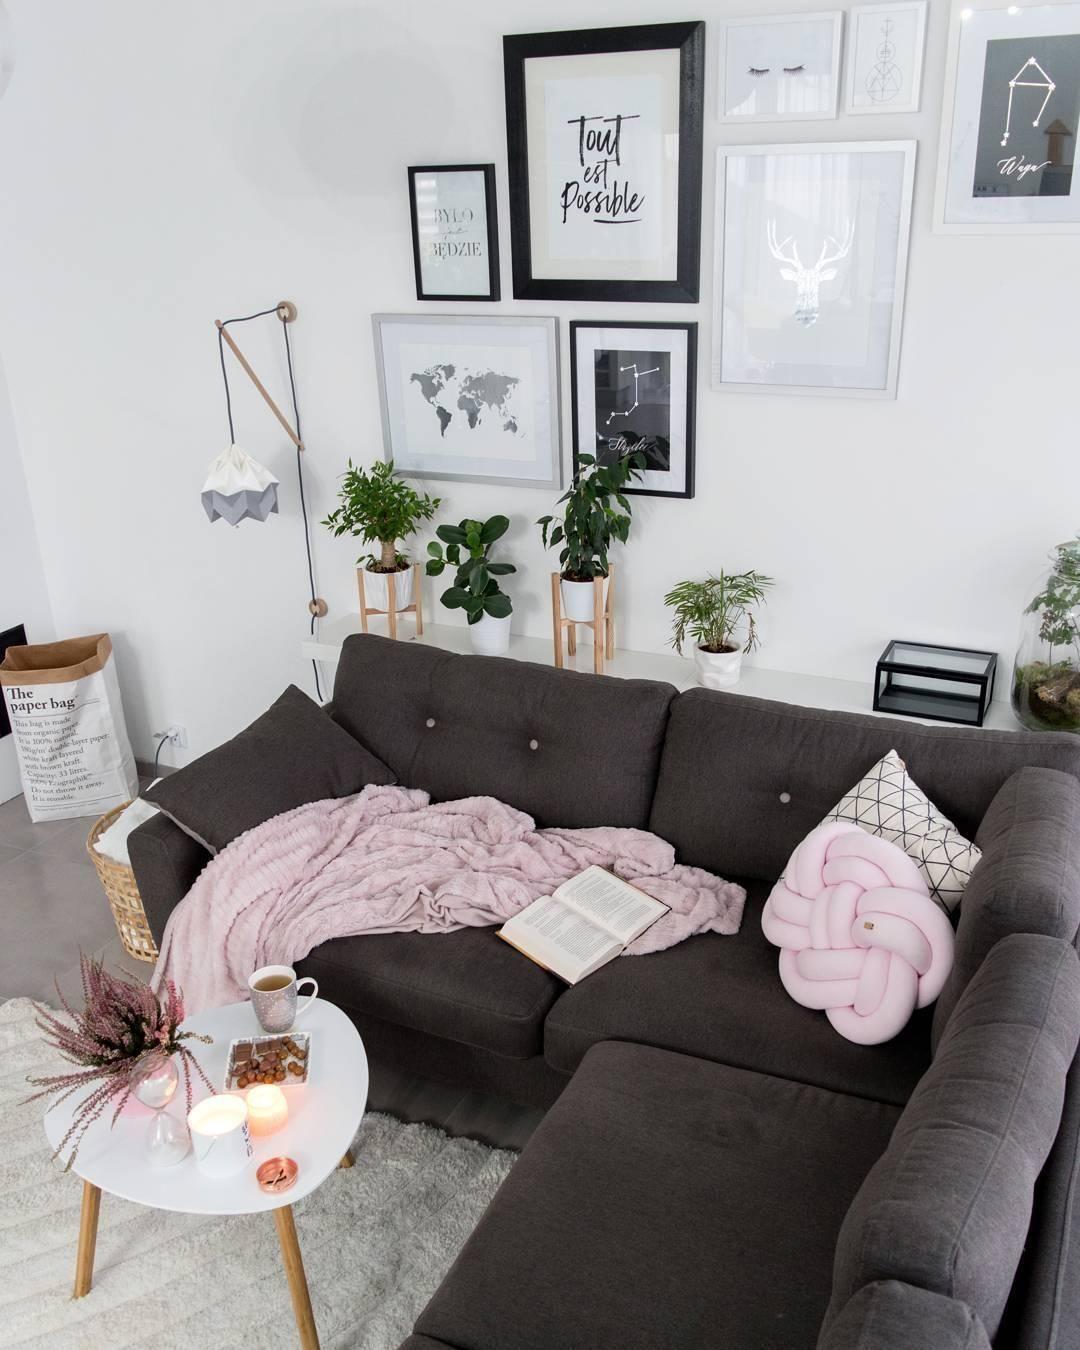 Beistelltisch-Set Latte, 2-tlg | Living rooms, Room and Interiors